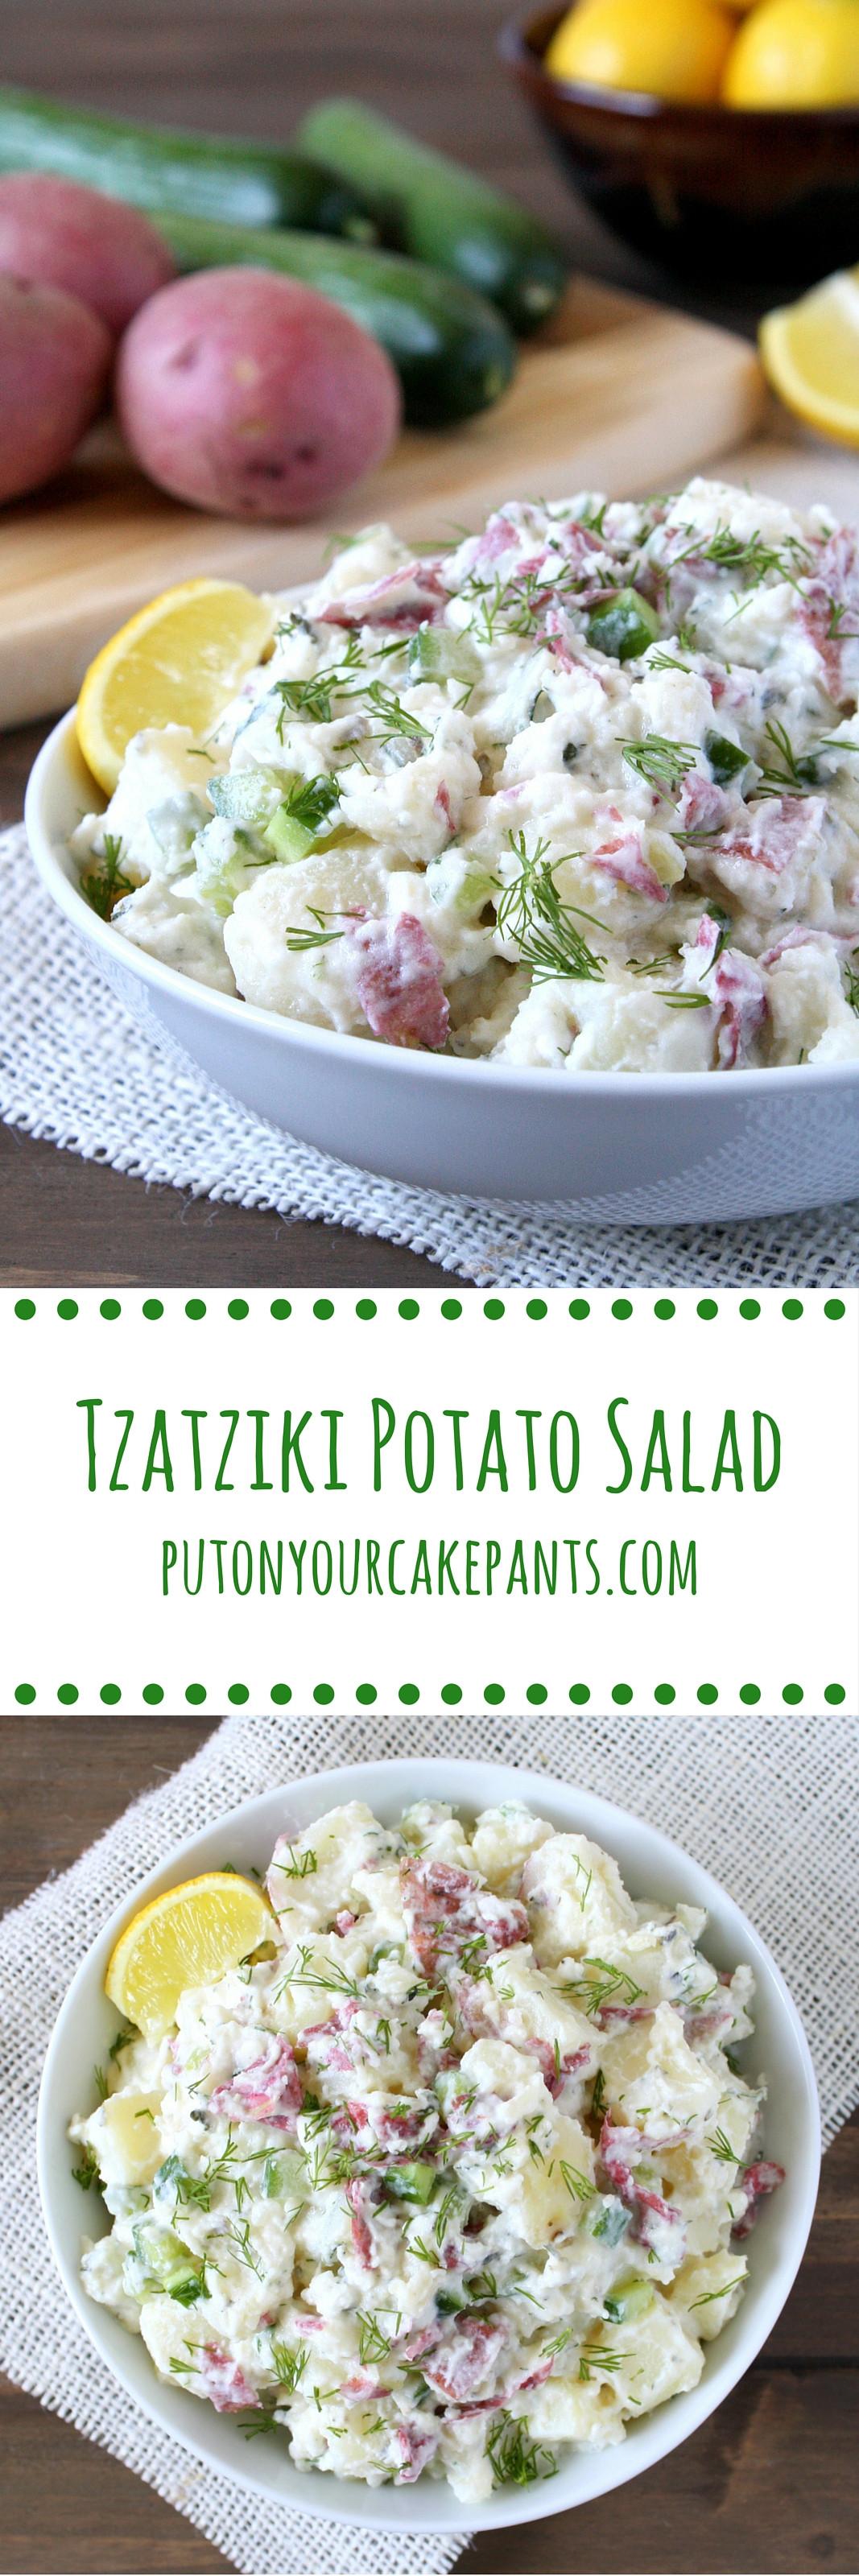 Tzatziki Sauce Kroger  Tzatziki Potato Salad